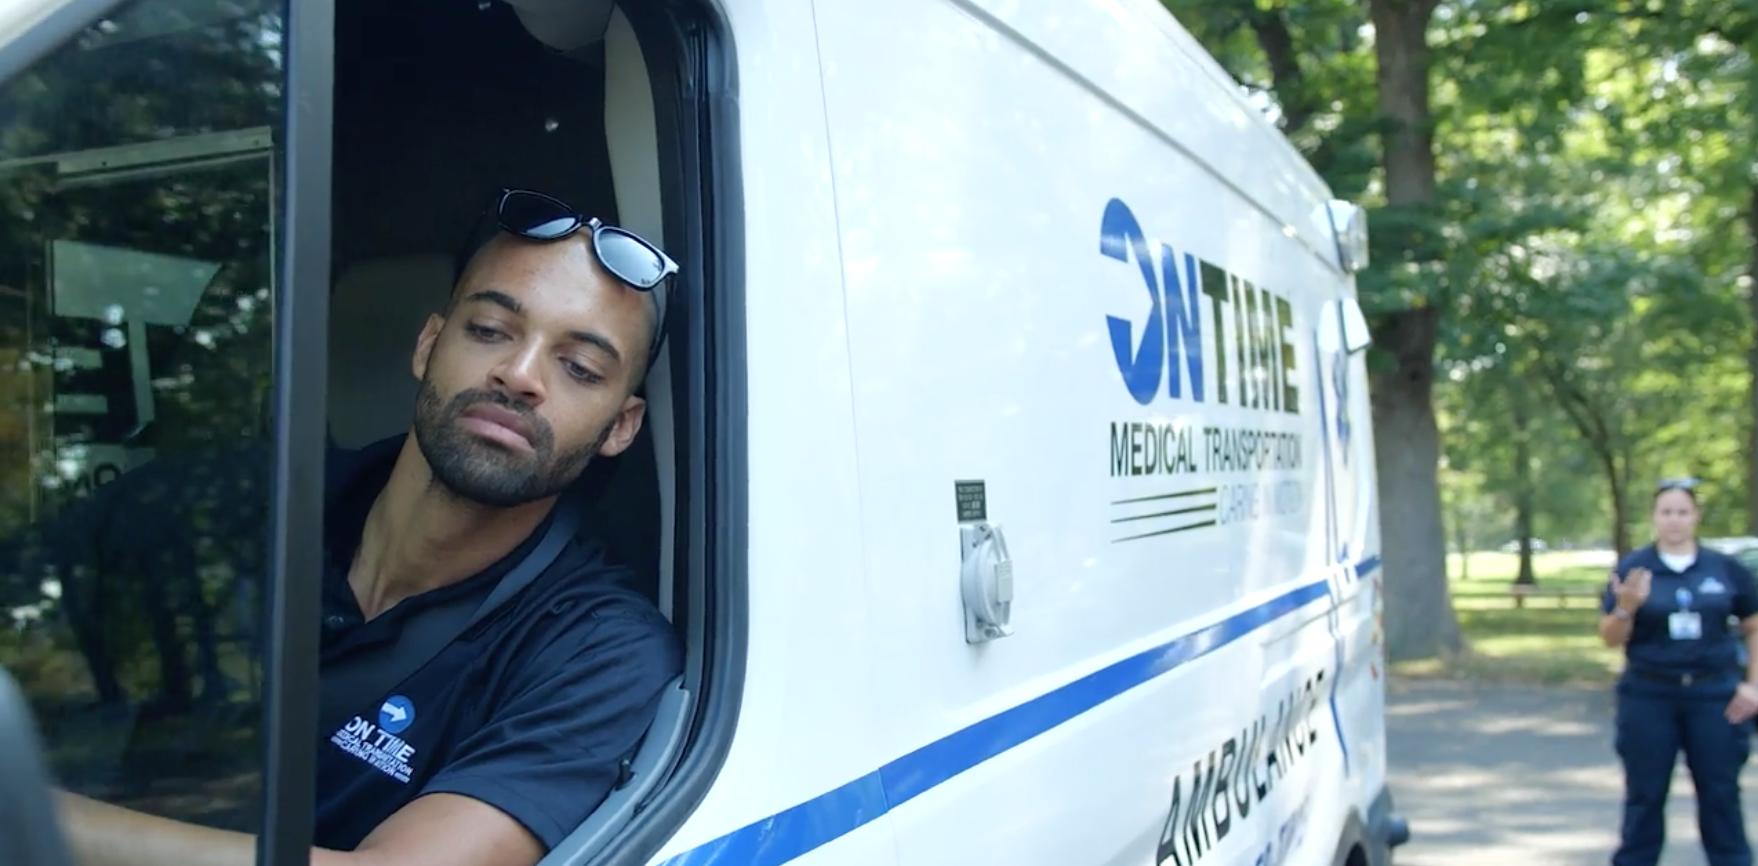 On Time Ambulance   EMR Jobs Roselle NJ